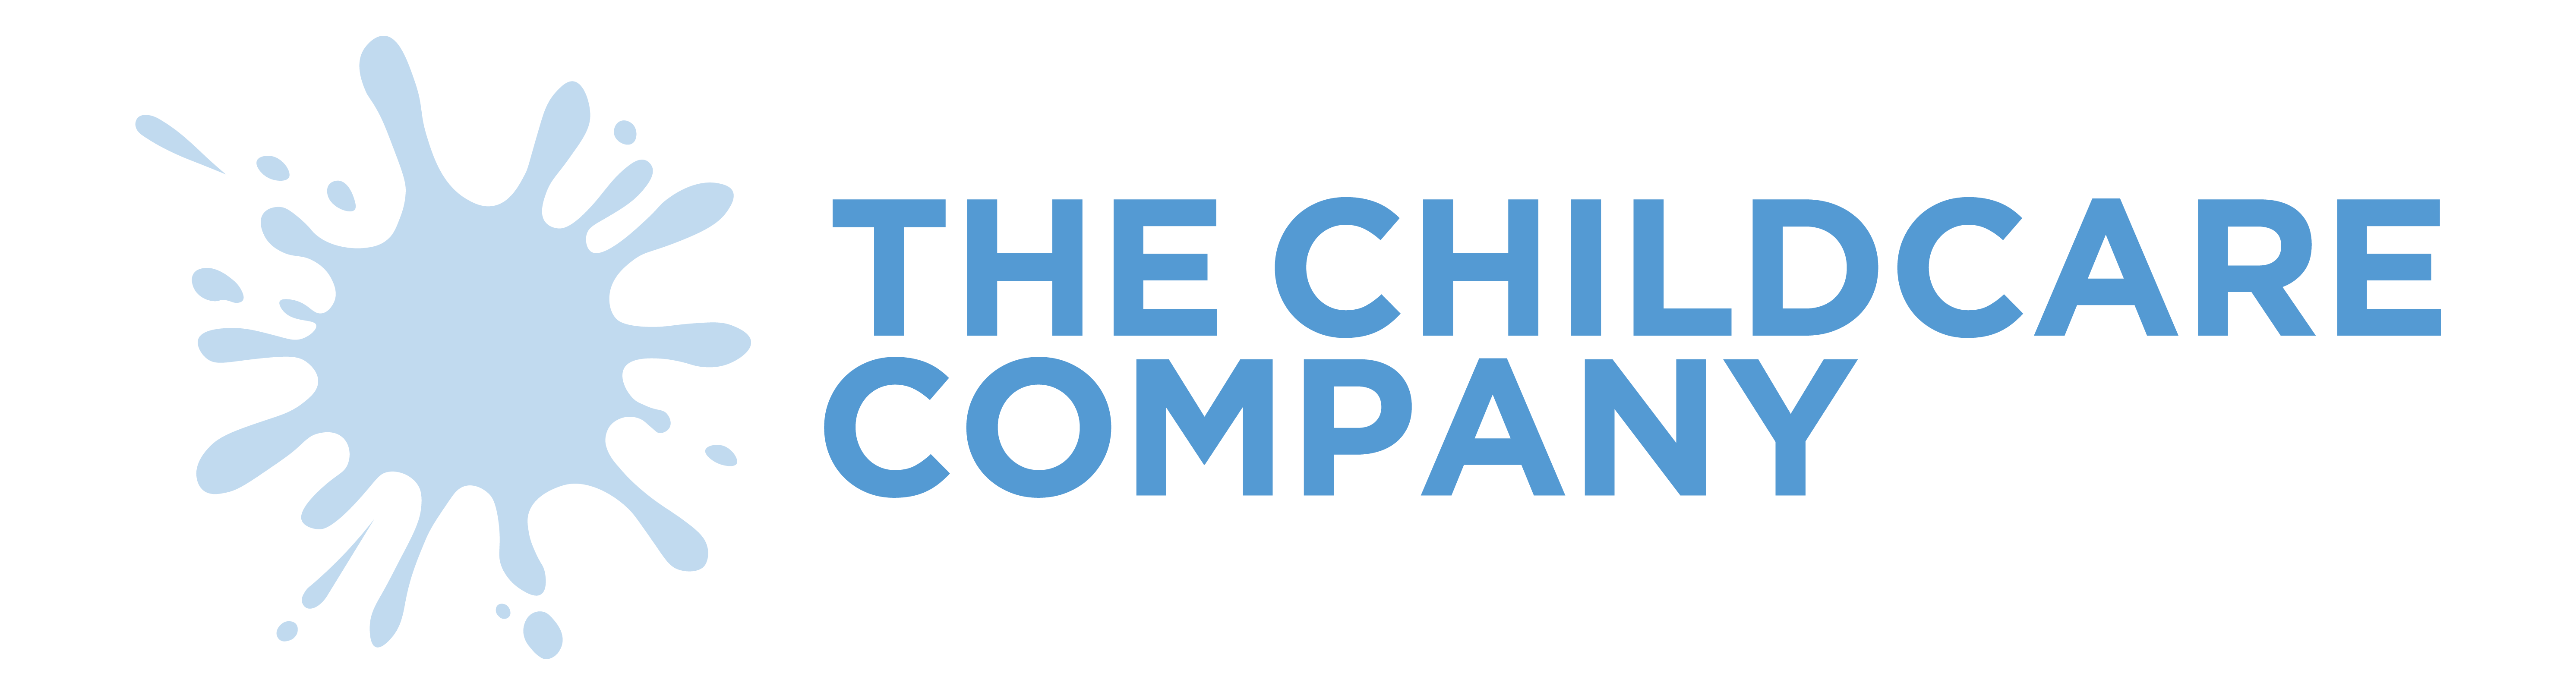 The Childcare Company